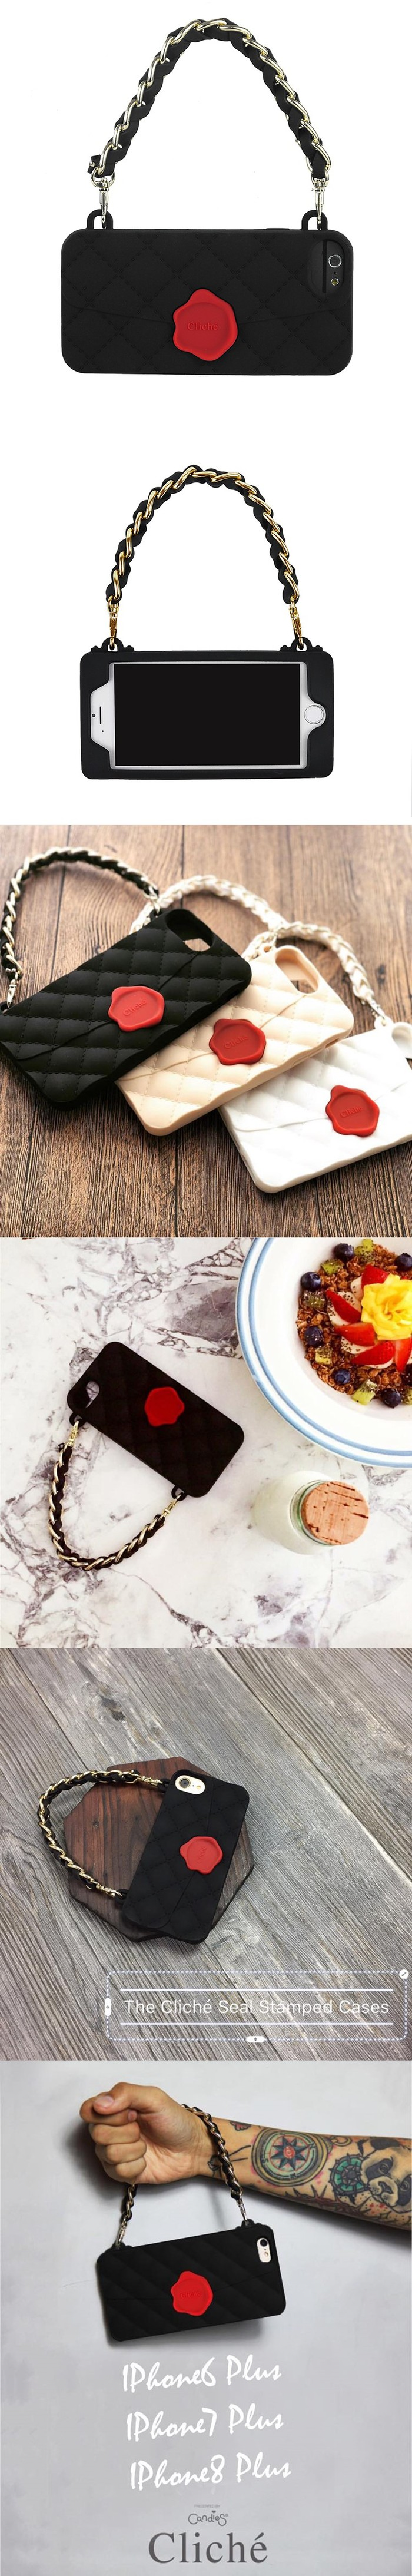 (複製)Candies|彩虹系列OVER THE RAINBOW手提包-IPhone X/XS